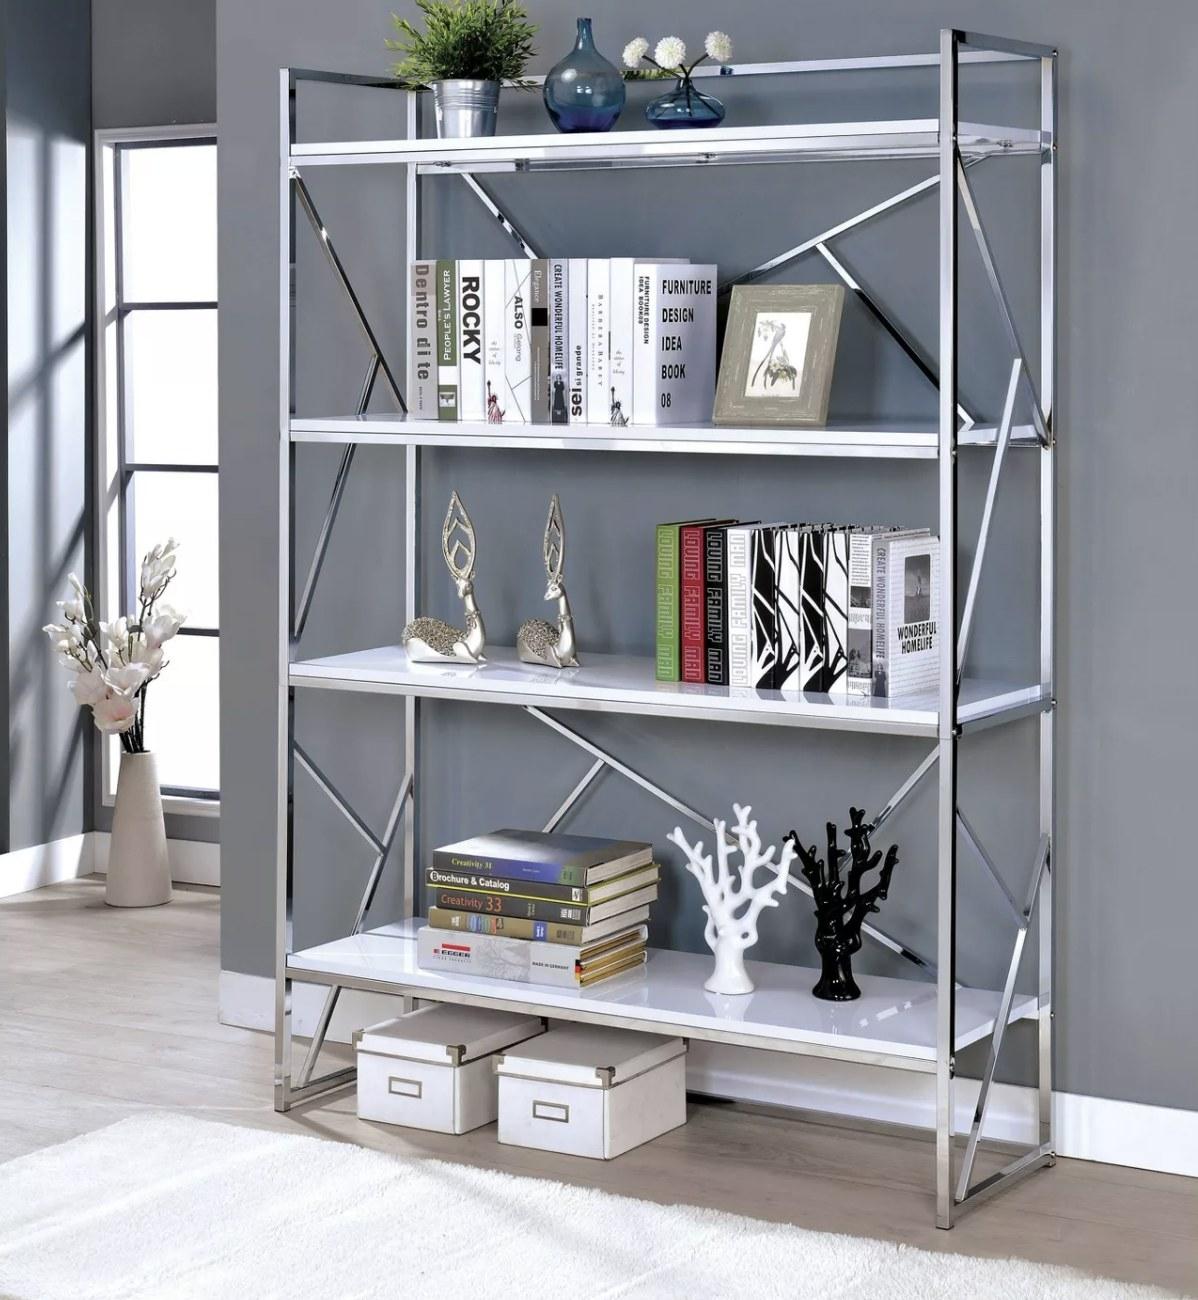 A silver chrome and white open bookcase